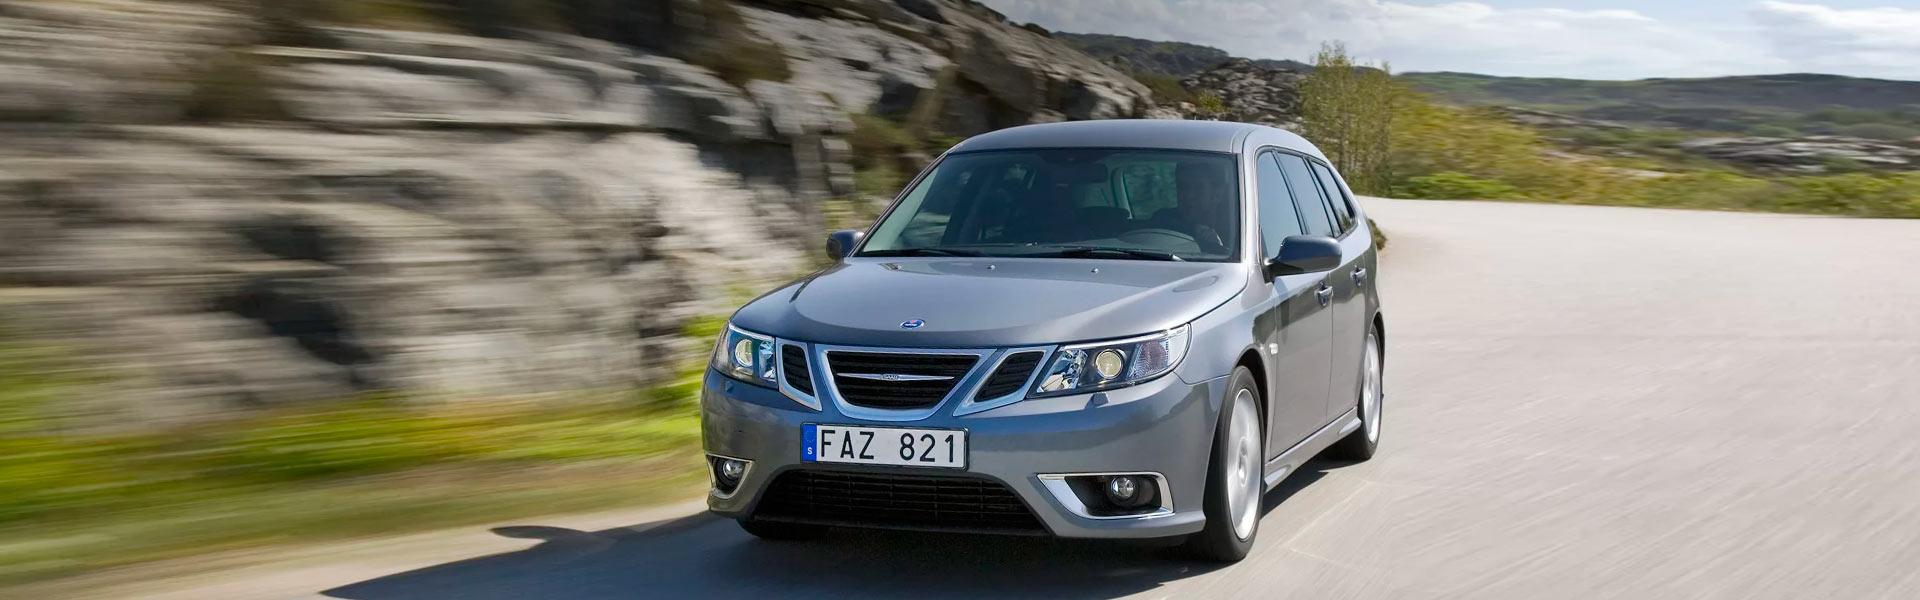 Сервис Saab 9000